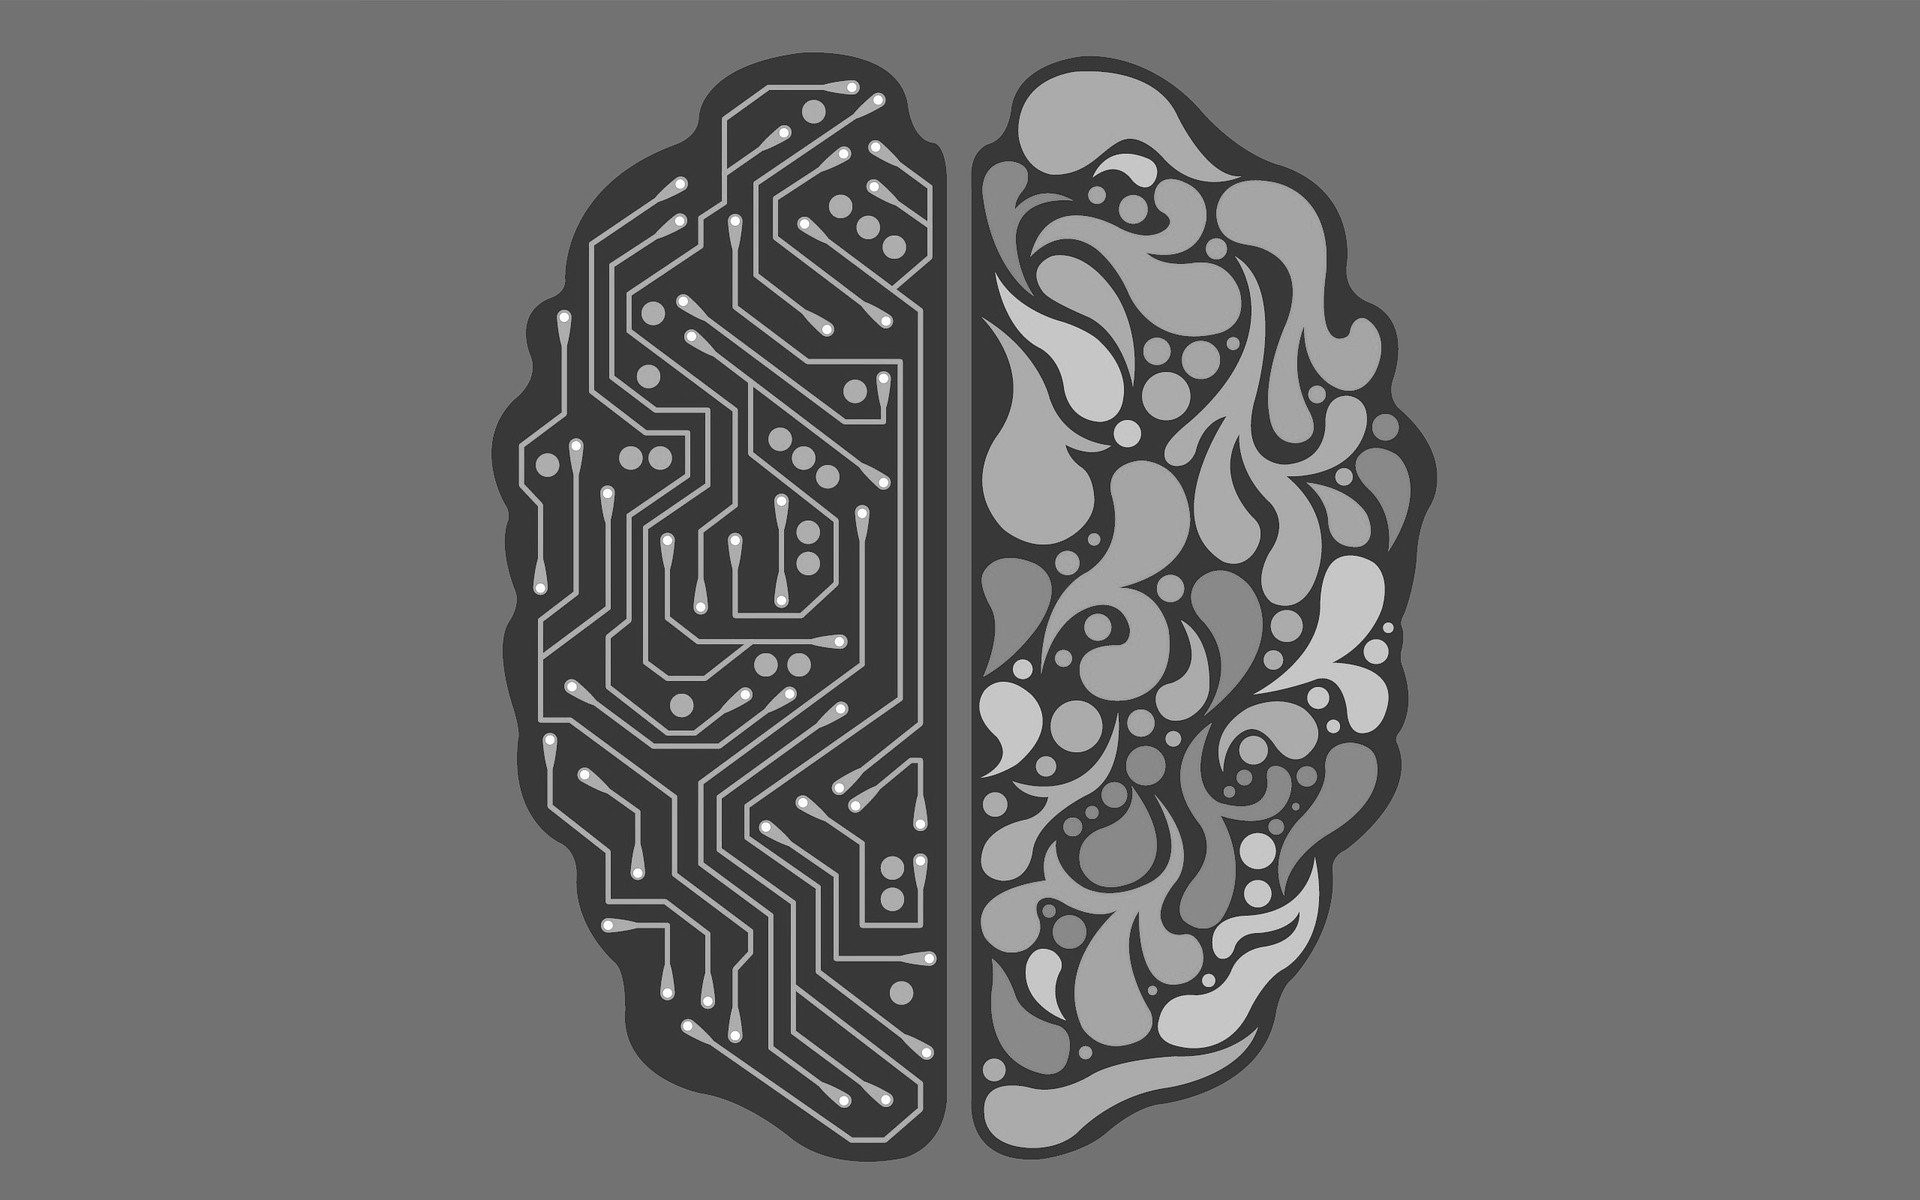 brain - hersenen